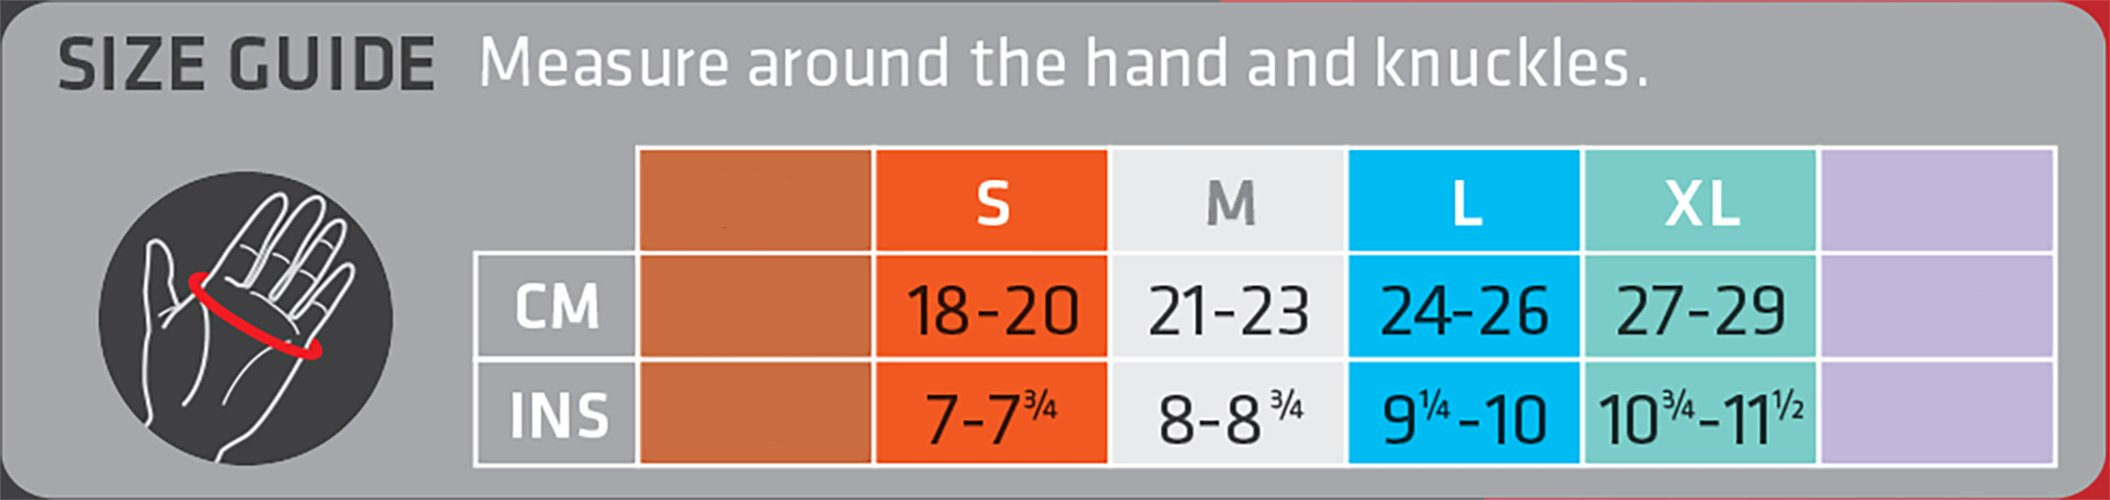 Thermoskin Full Finger Arthritis Gloves, Black, Medium by Thermoskin (Image #2)